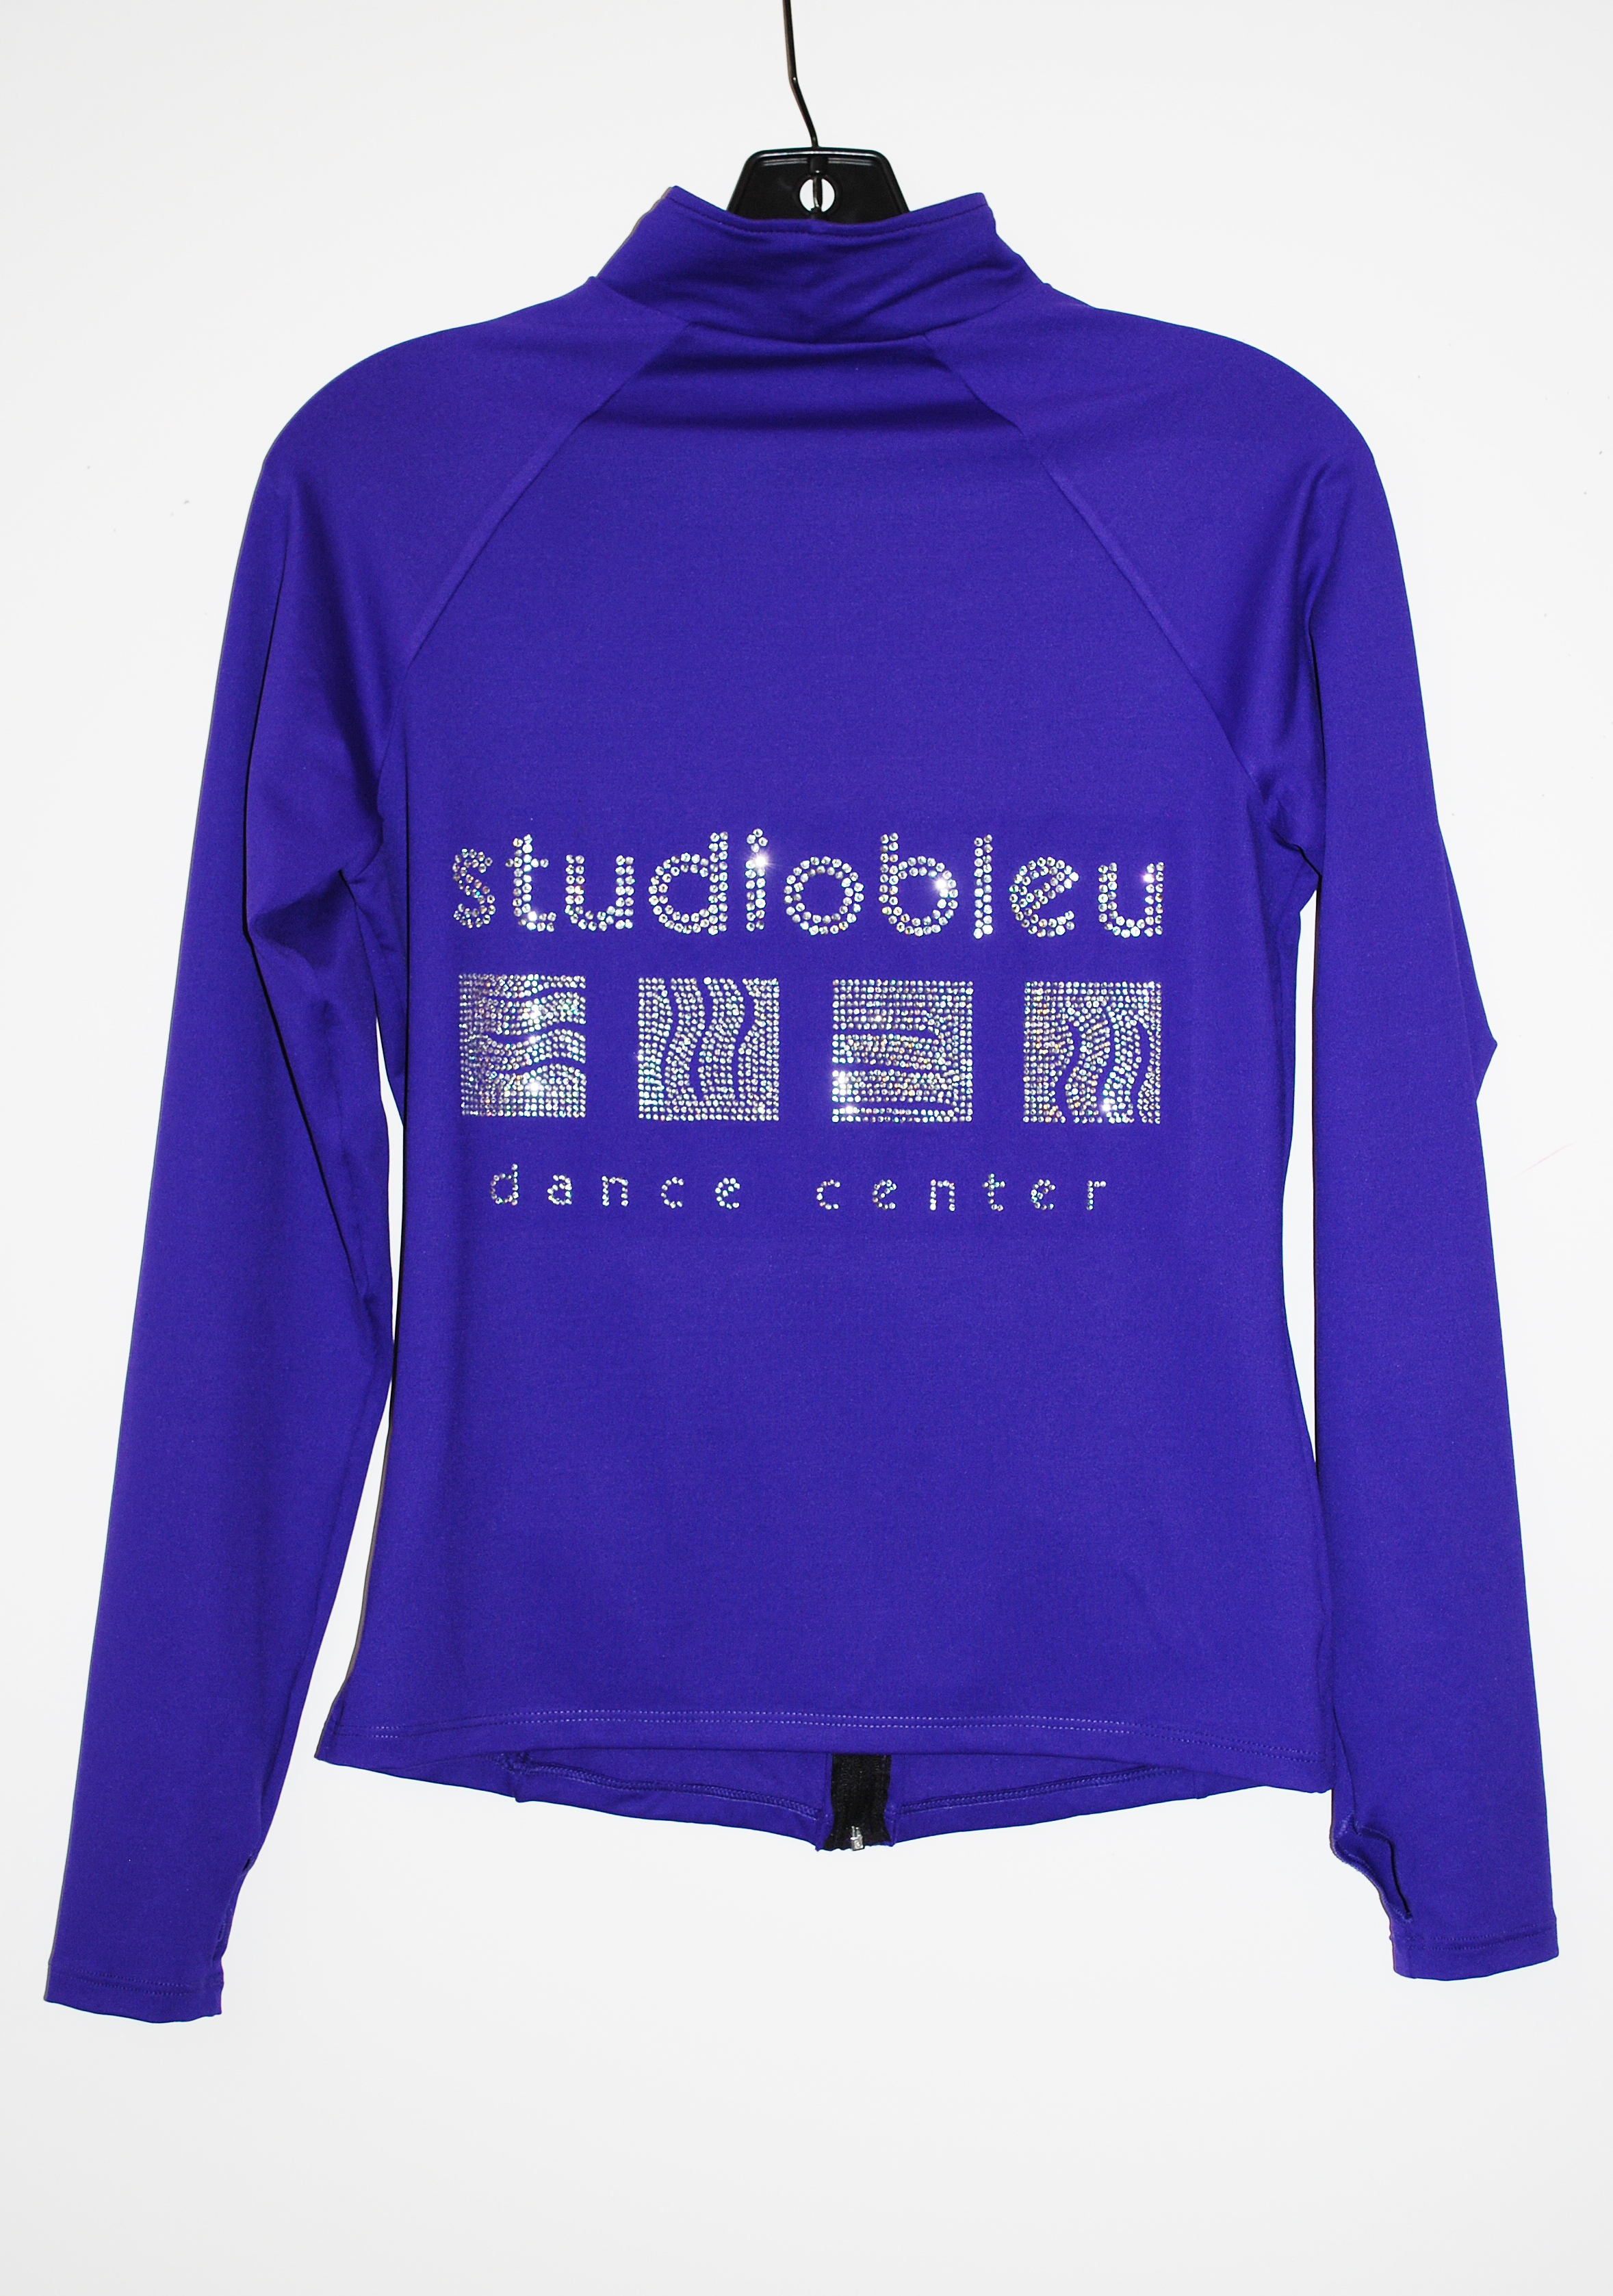 1 Purple jacket back view stones.jpg